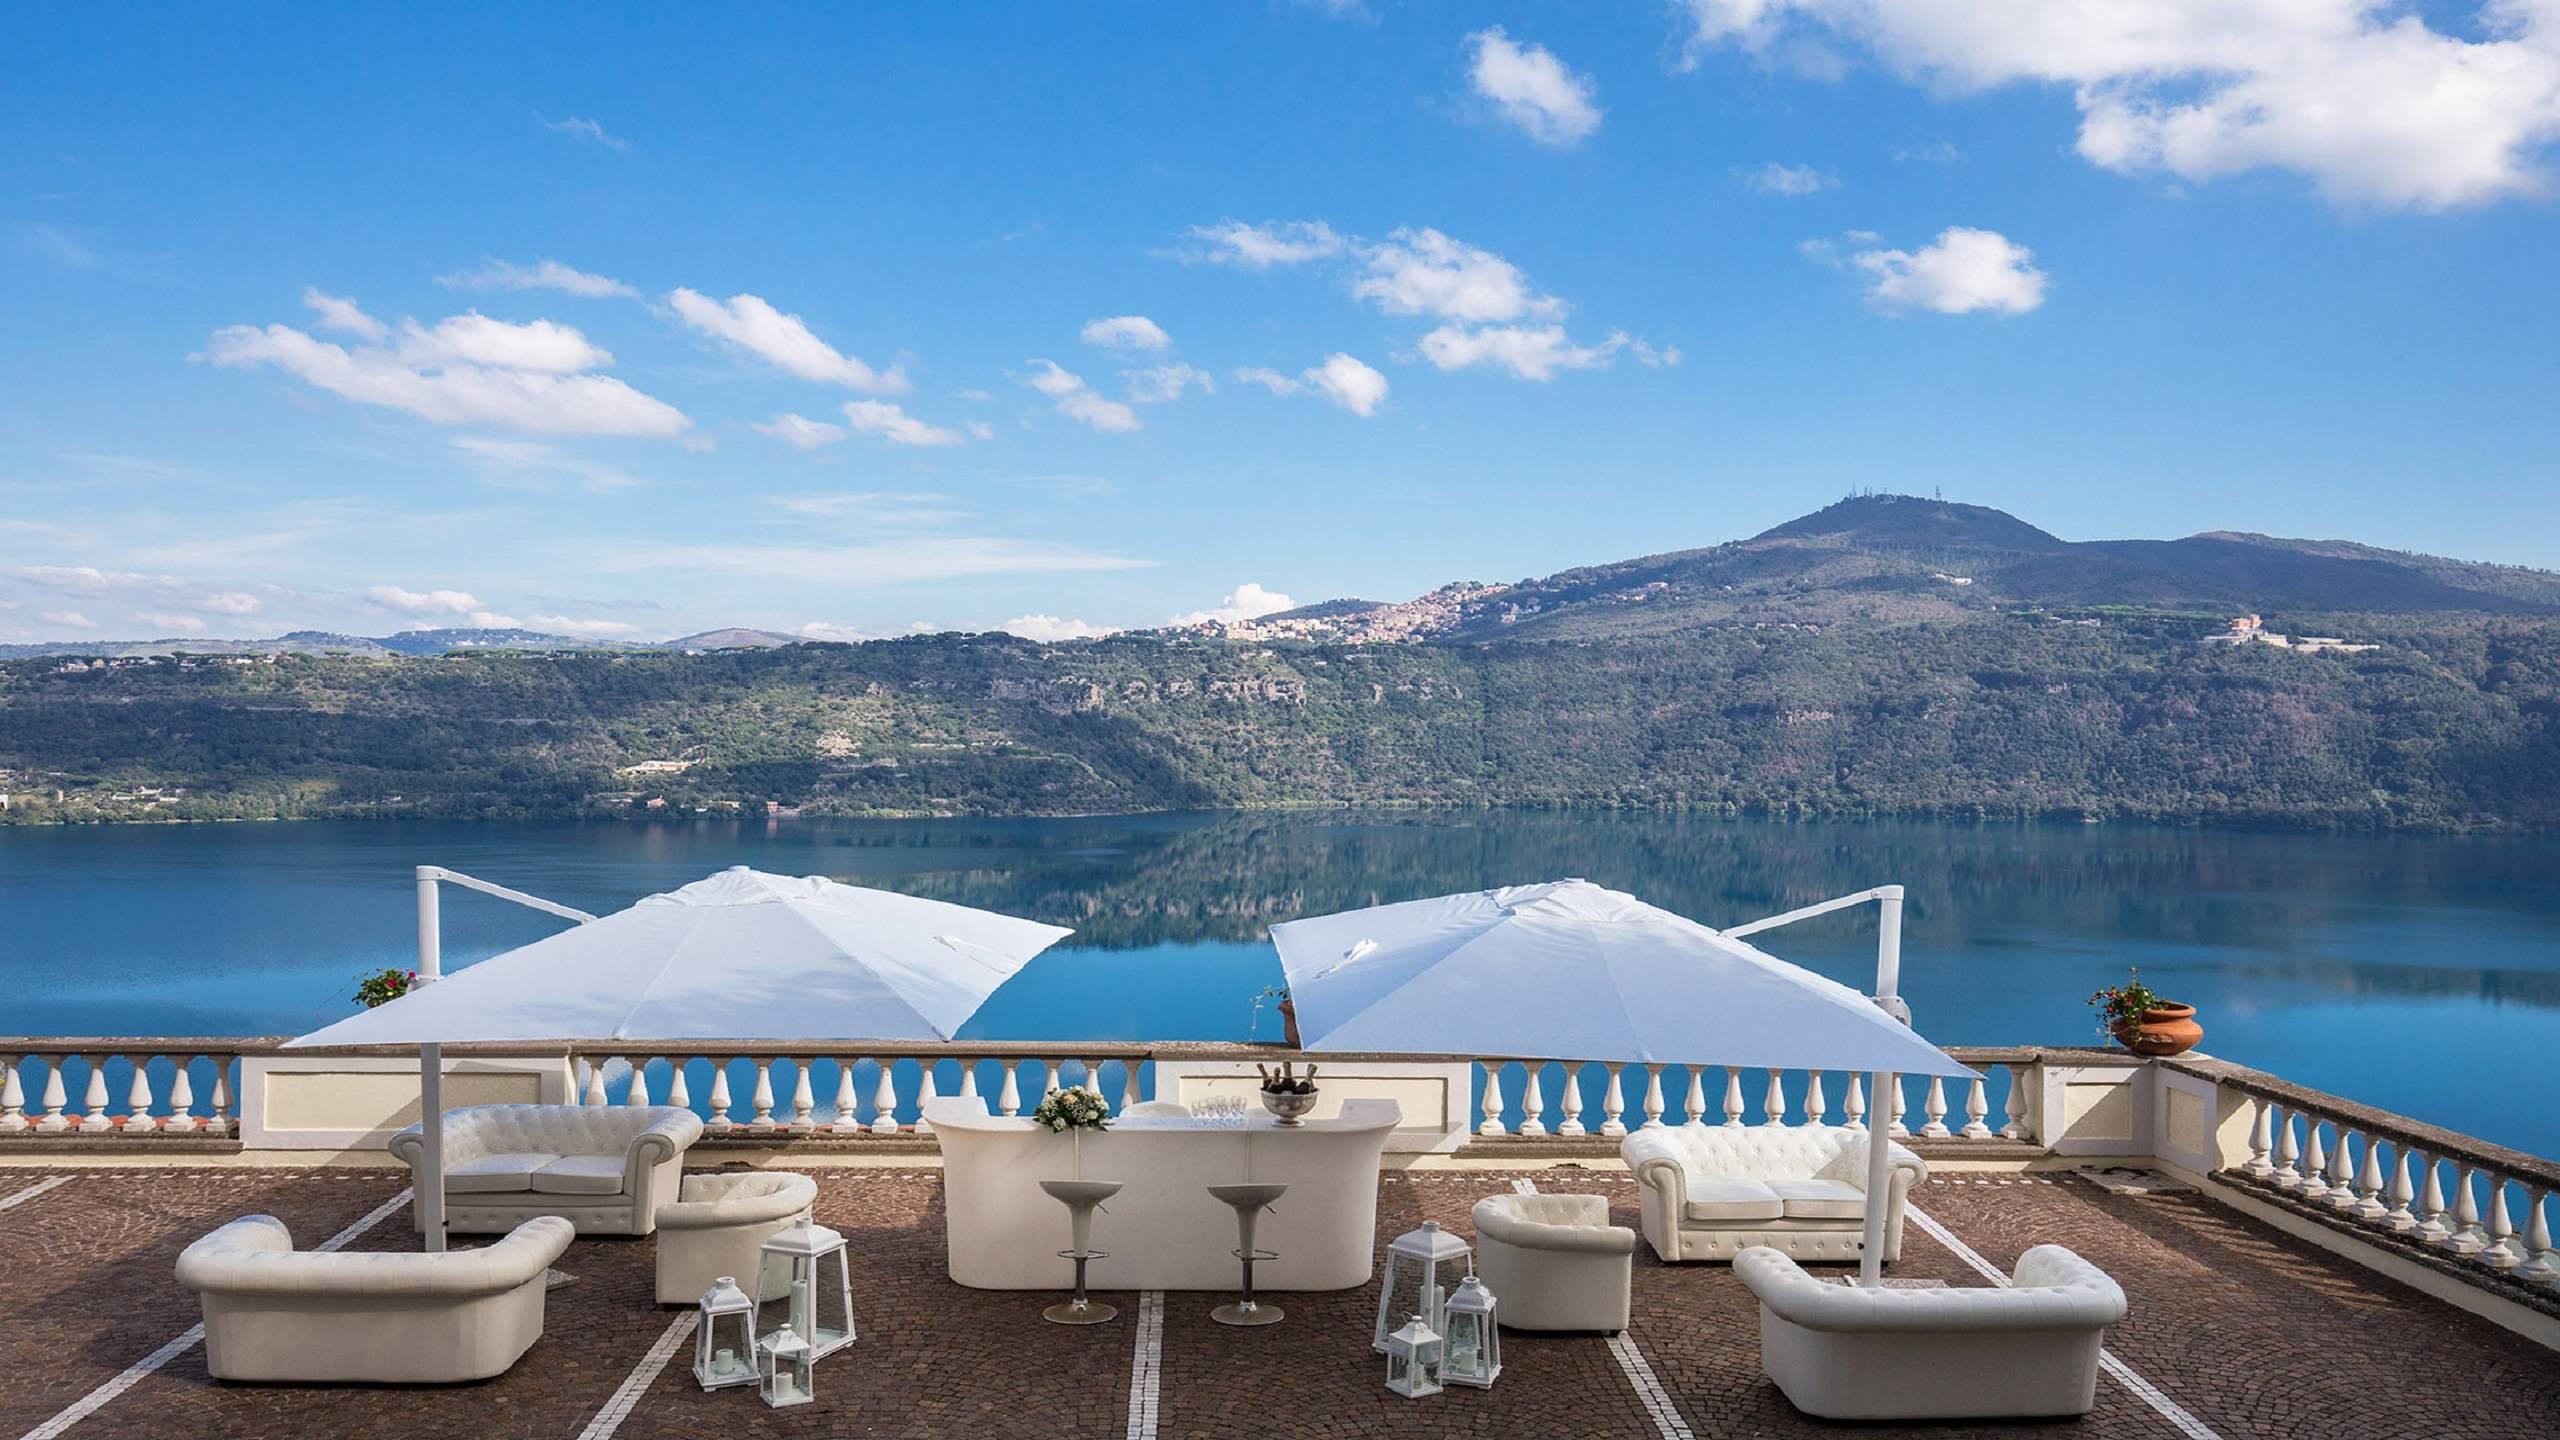 Hotel-Castel-Vecchio-Terrace-Lake-Gazebo